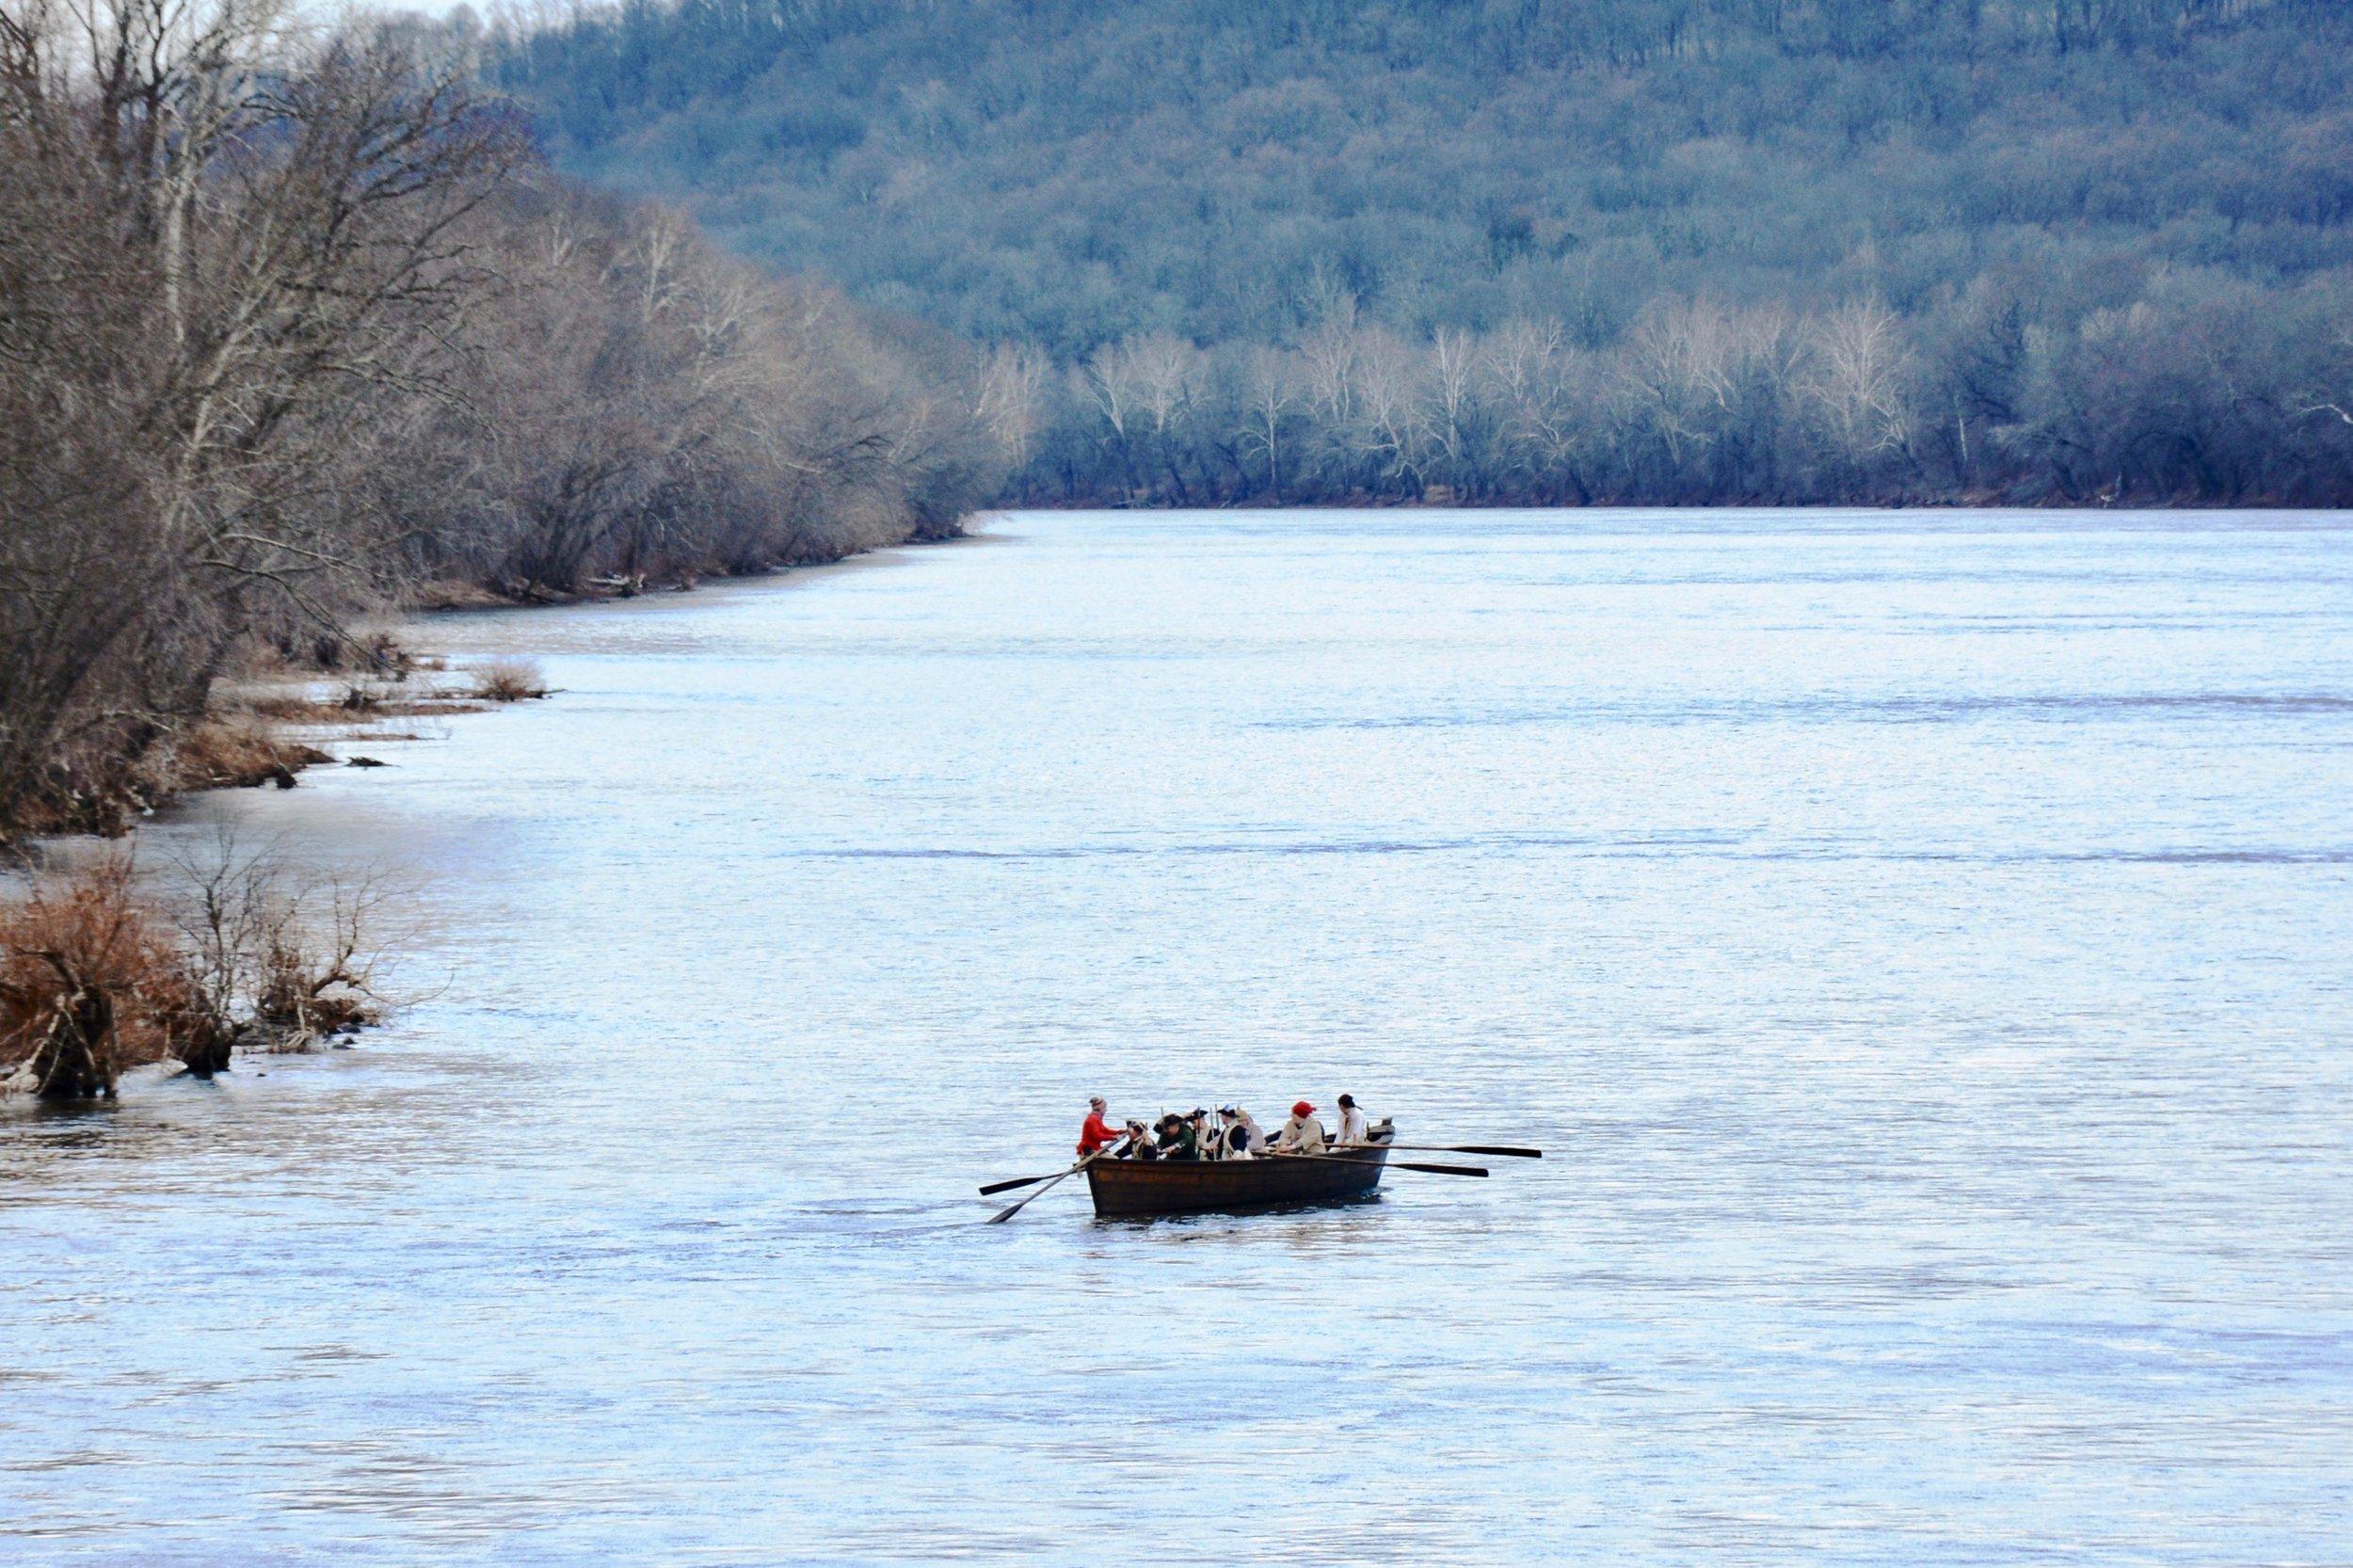 Actors reenact General Washington's historic Christmas Day crossing of the Delaware River.